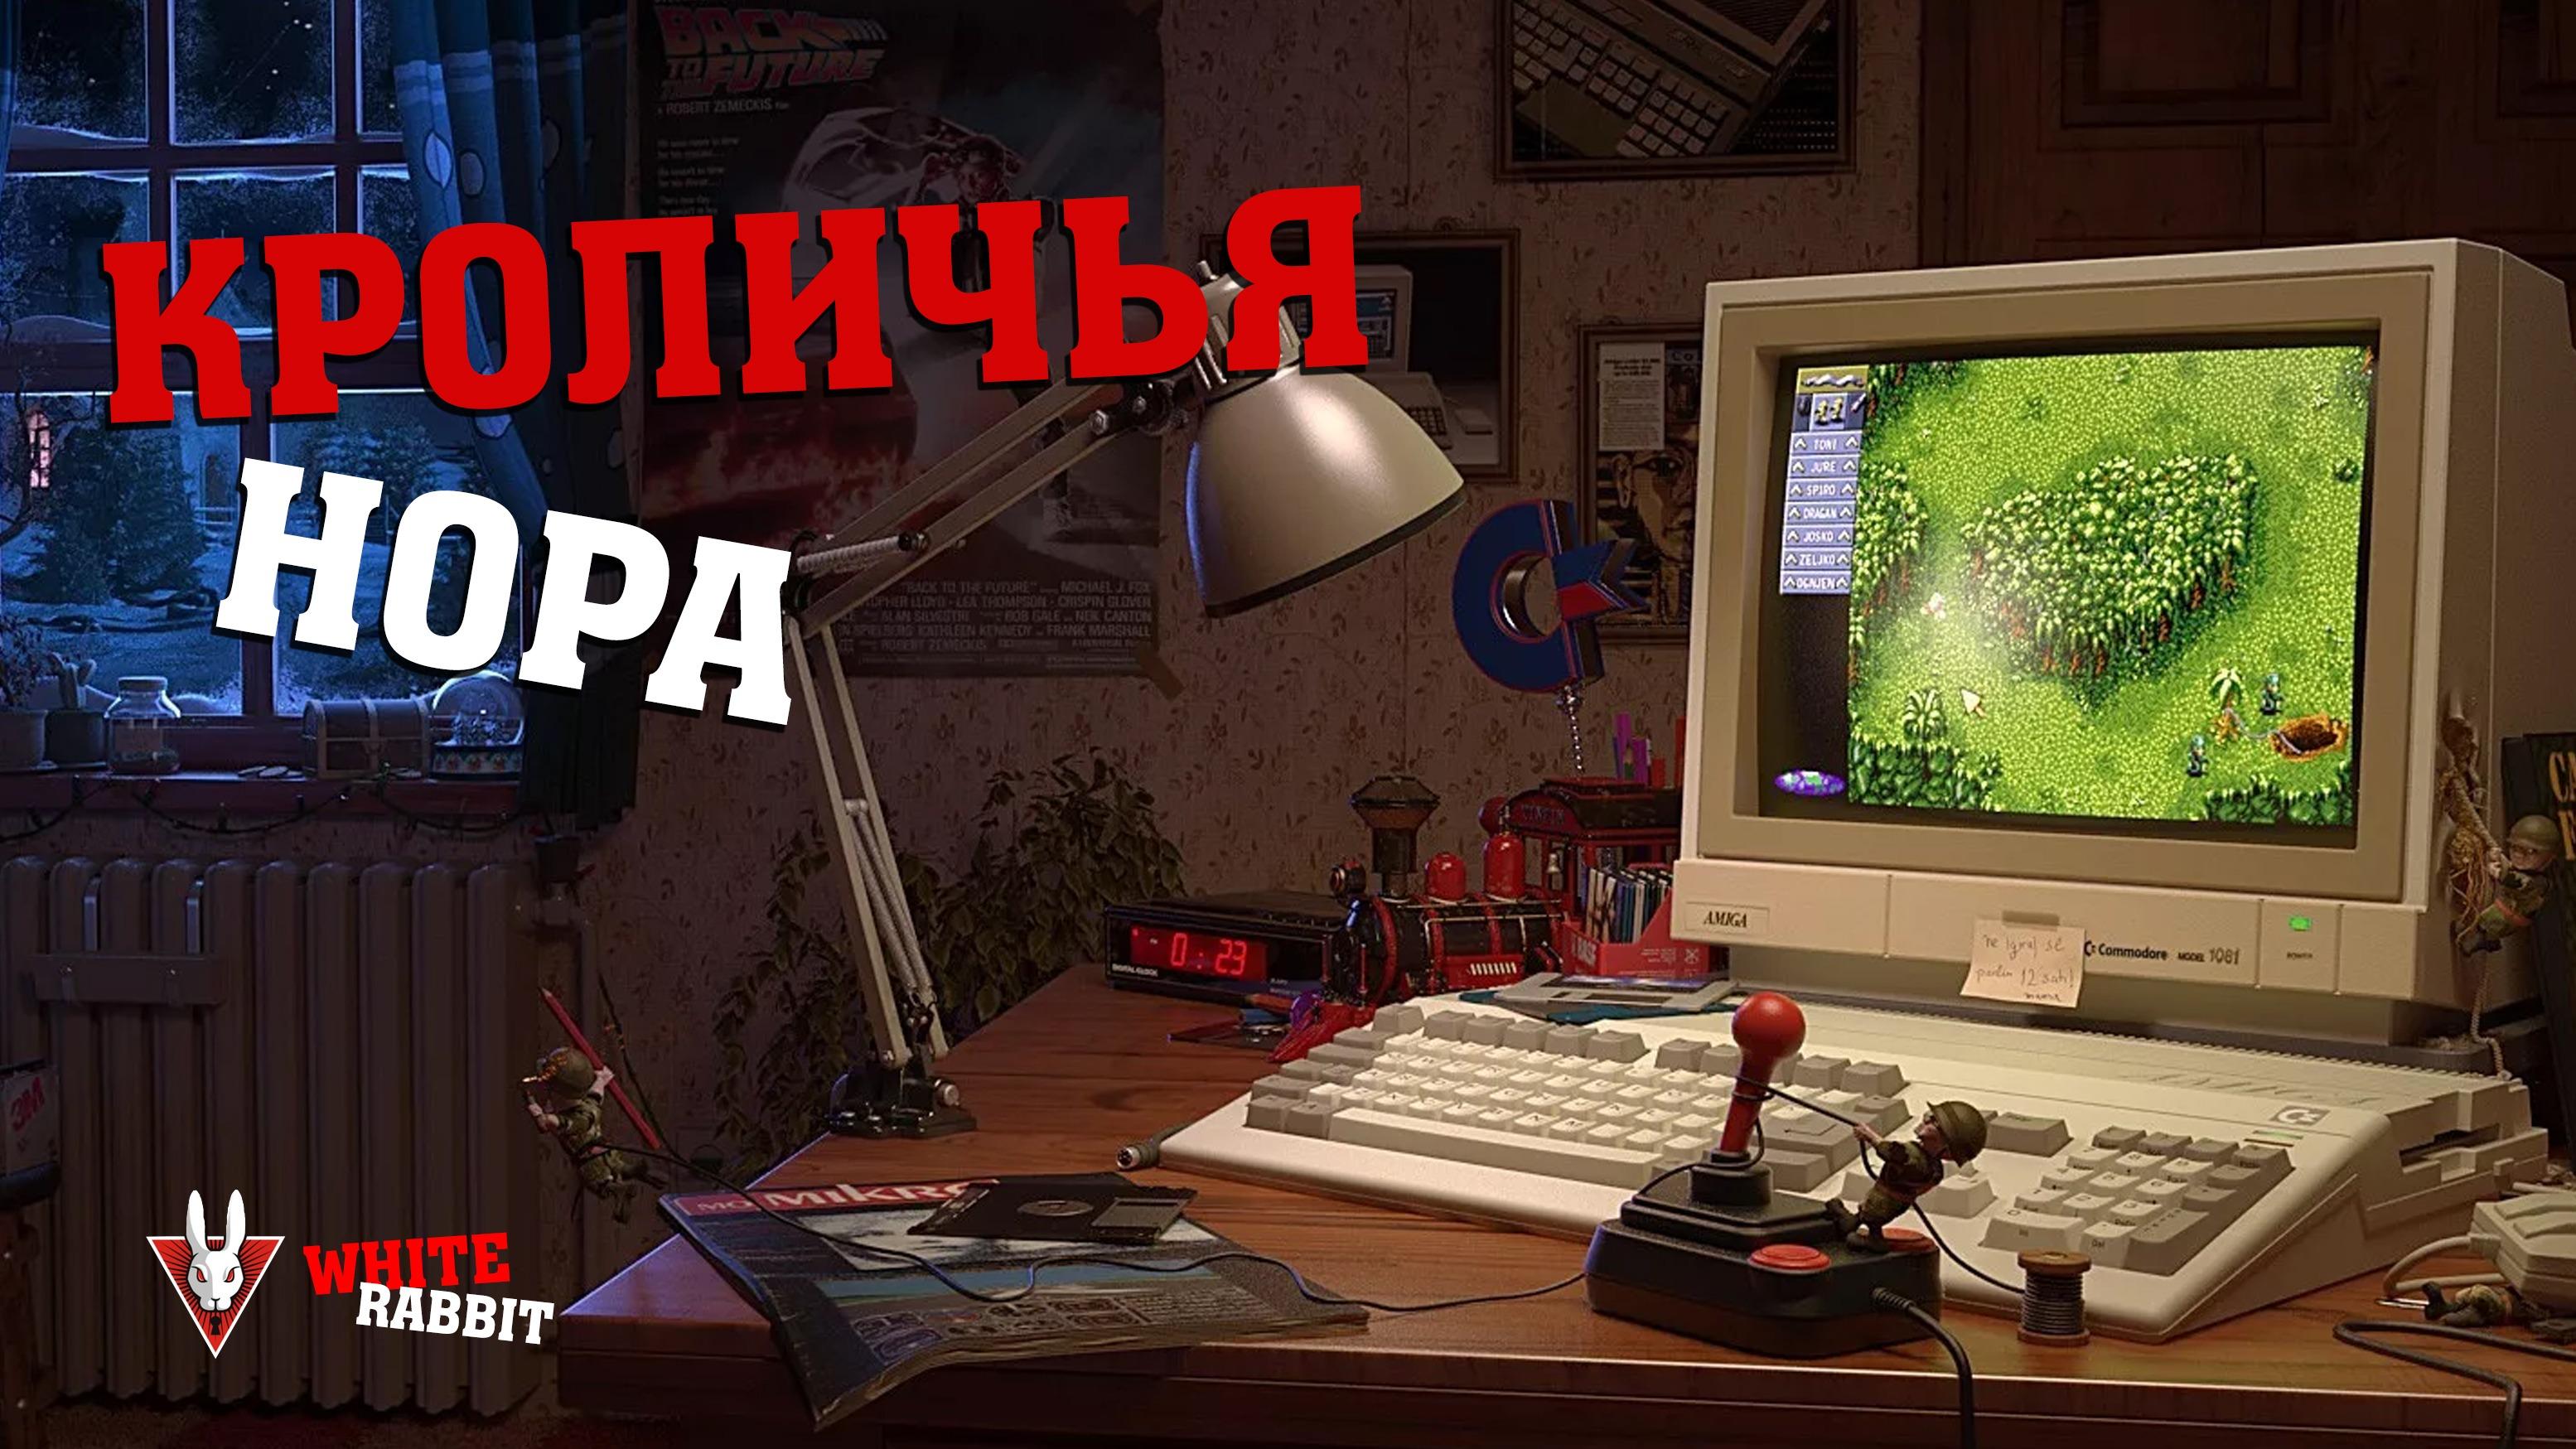 http://telegra.ph/file/a7900662ee090dd4a562f.jpg